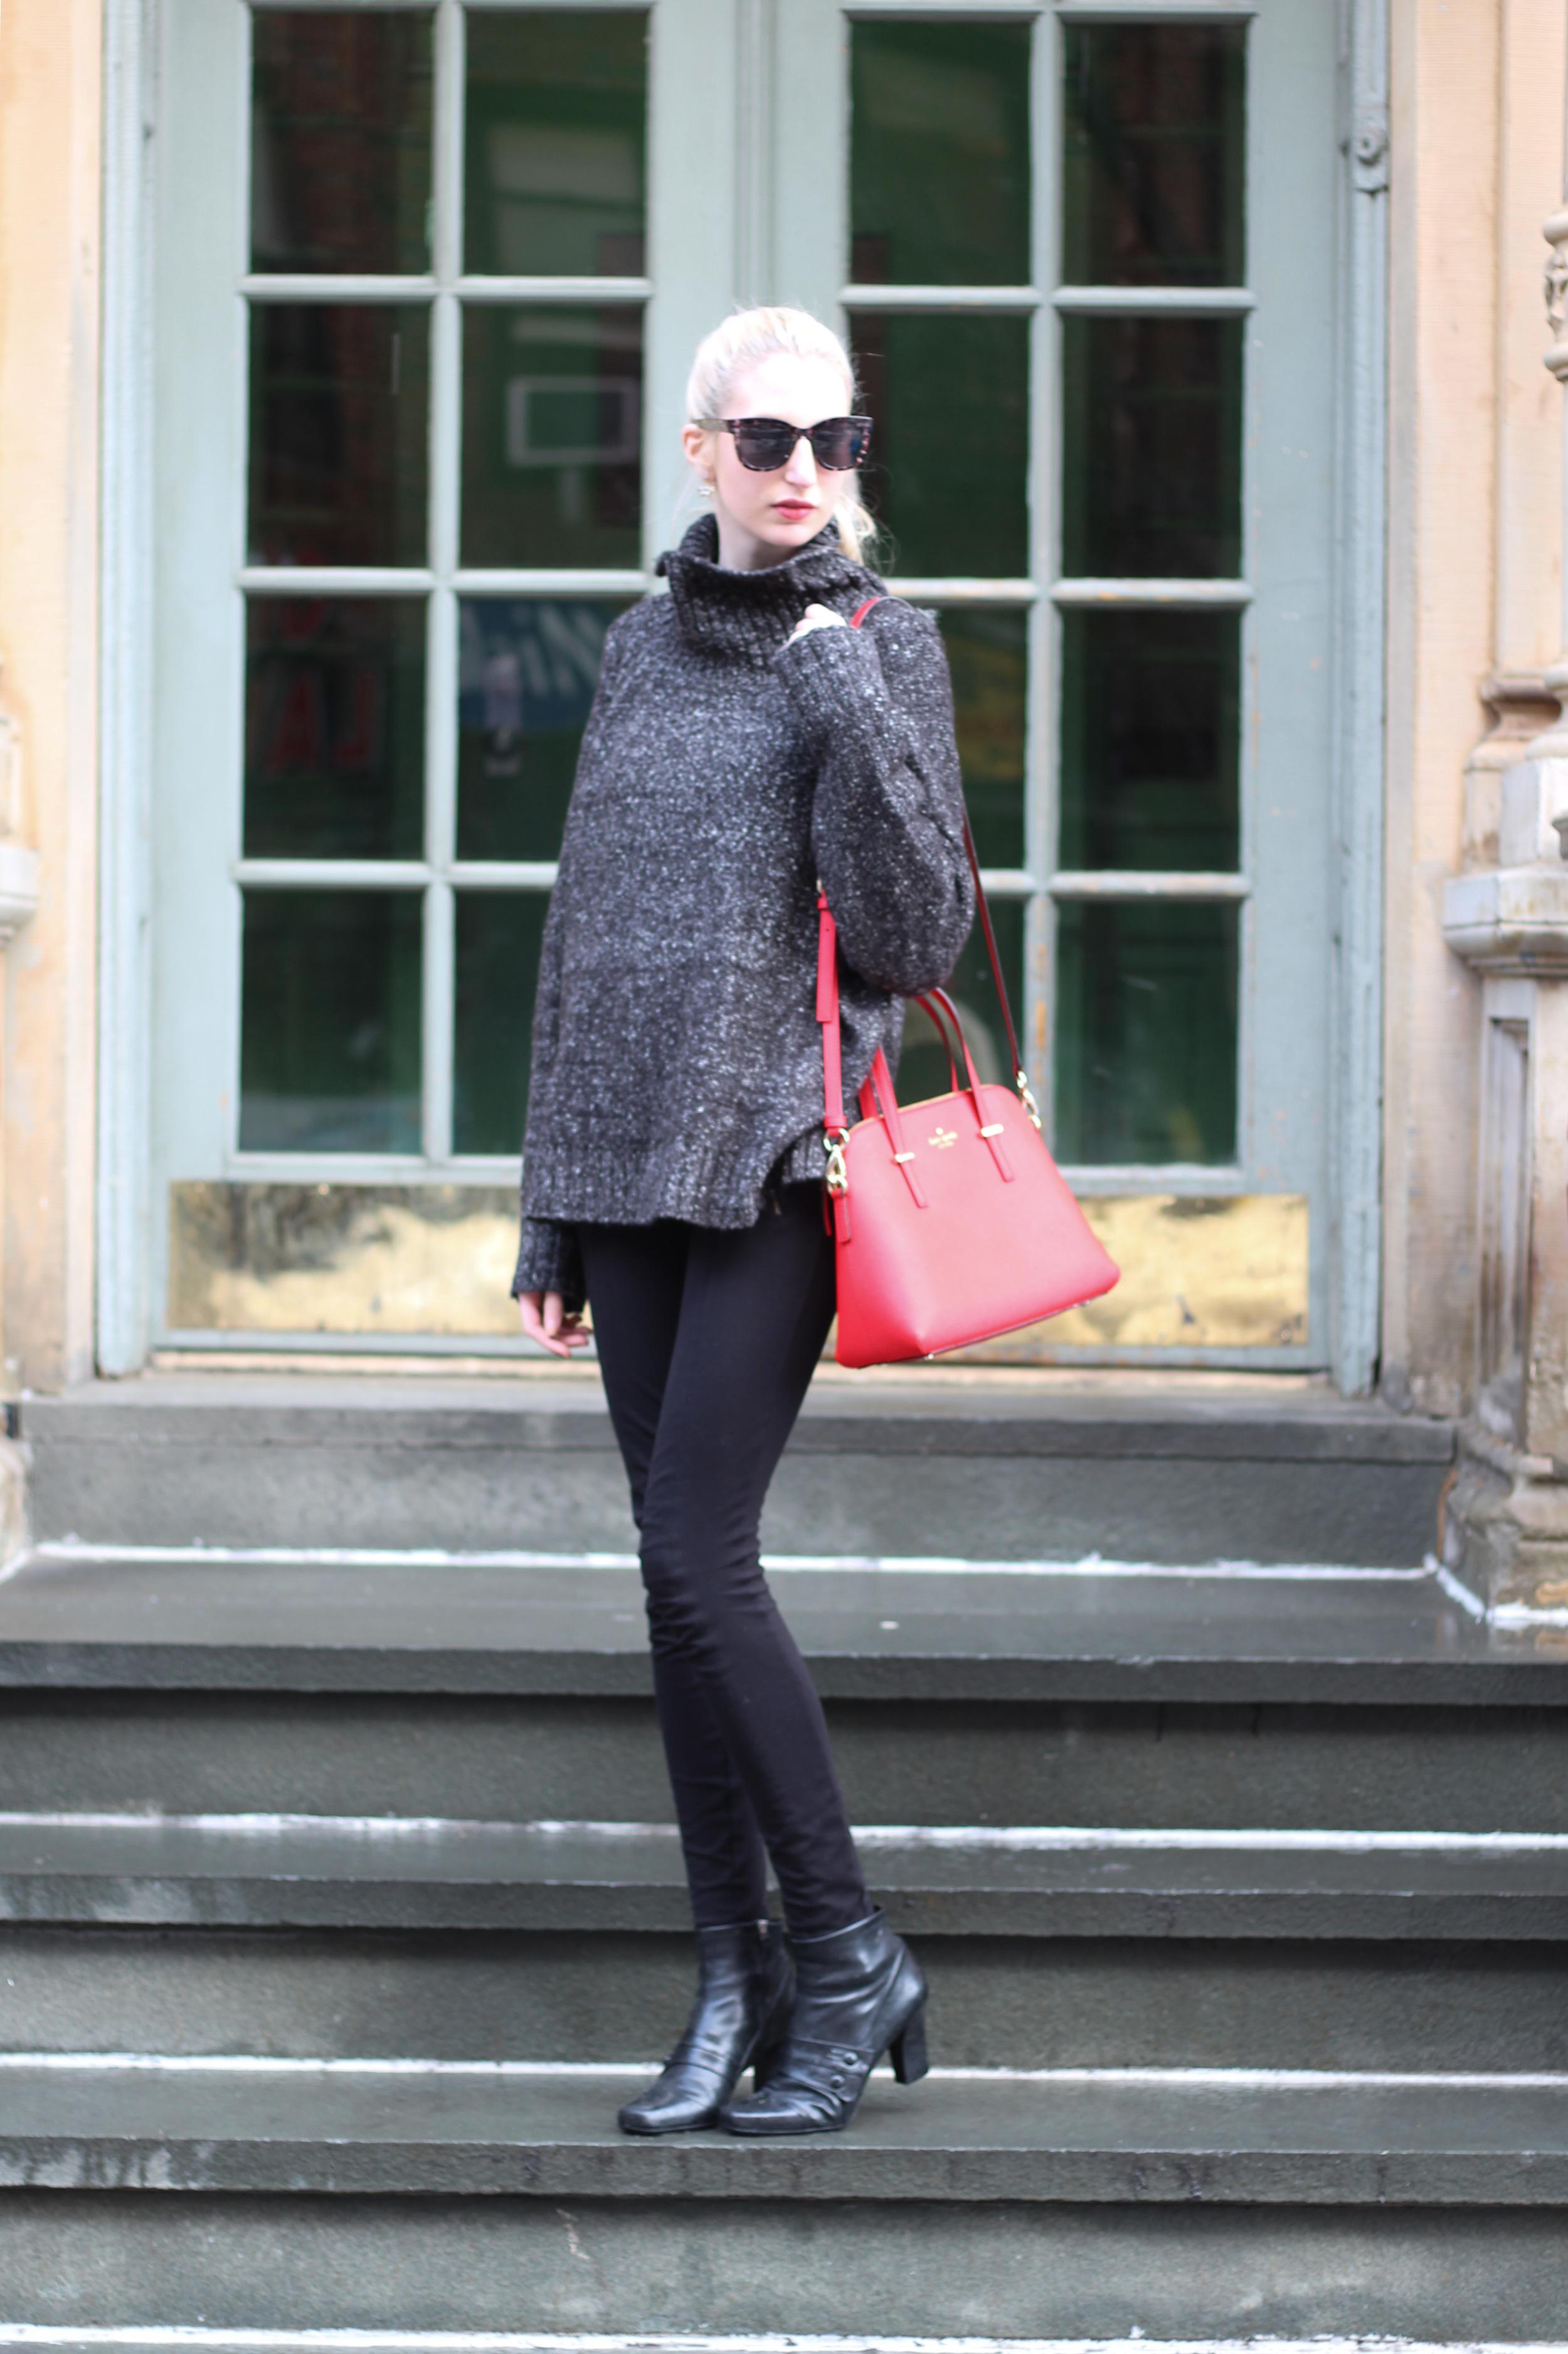 H&M oversized sweater, J.Crew Factory pixie pants, vintage boots, LOFT sunglasses, Elizabeth Arden lipstick, Kate Spade Cedar Street Maise in Cherry Liquer, Stella and Dot Earrings